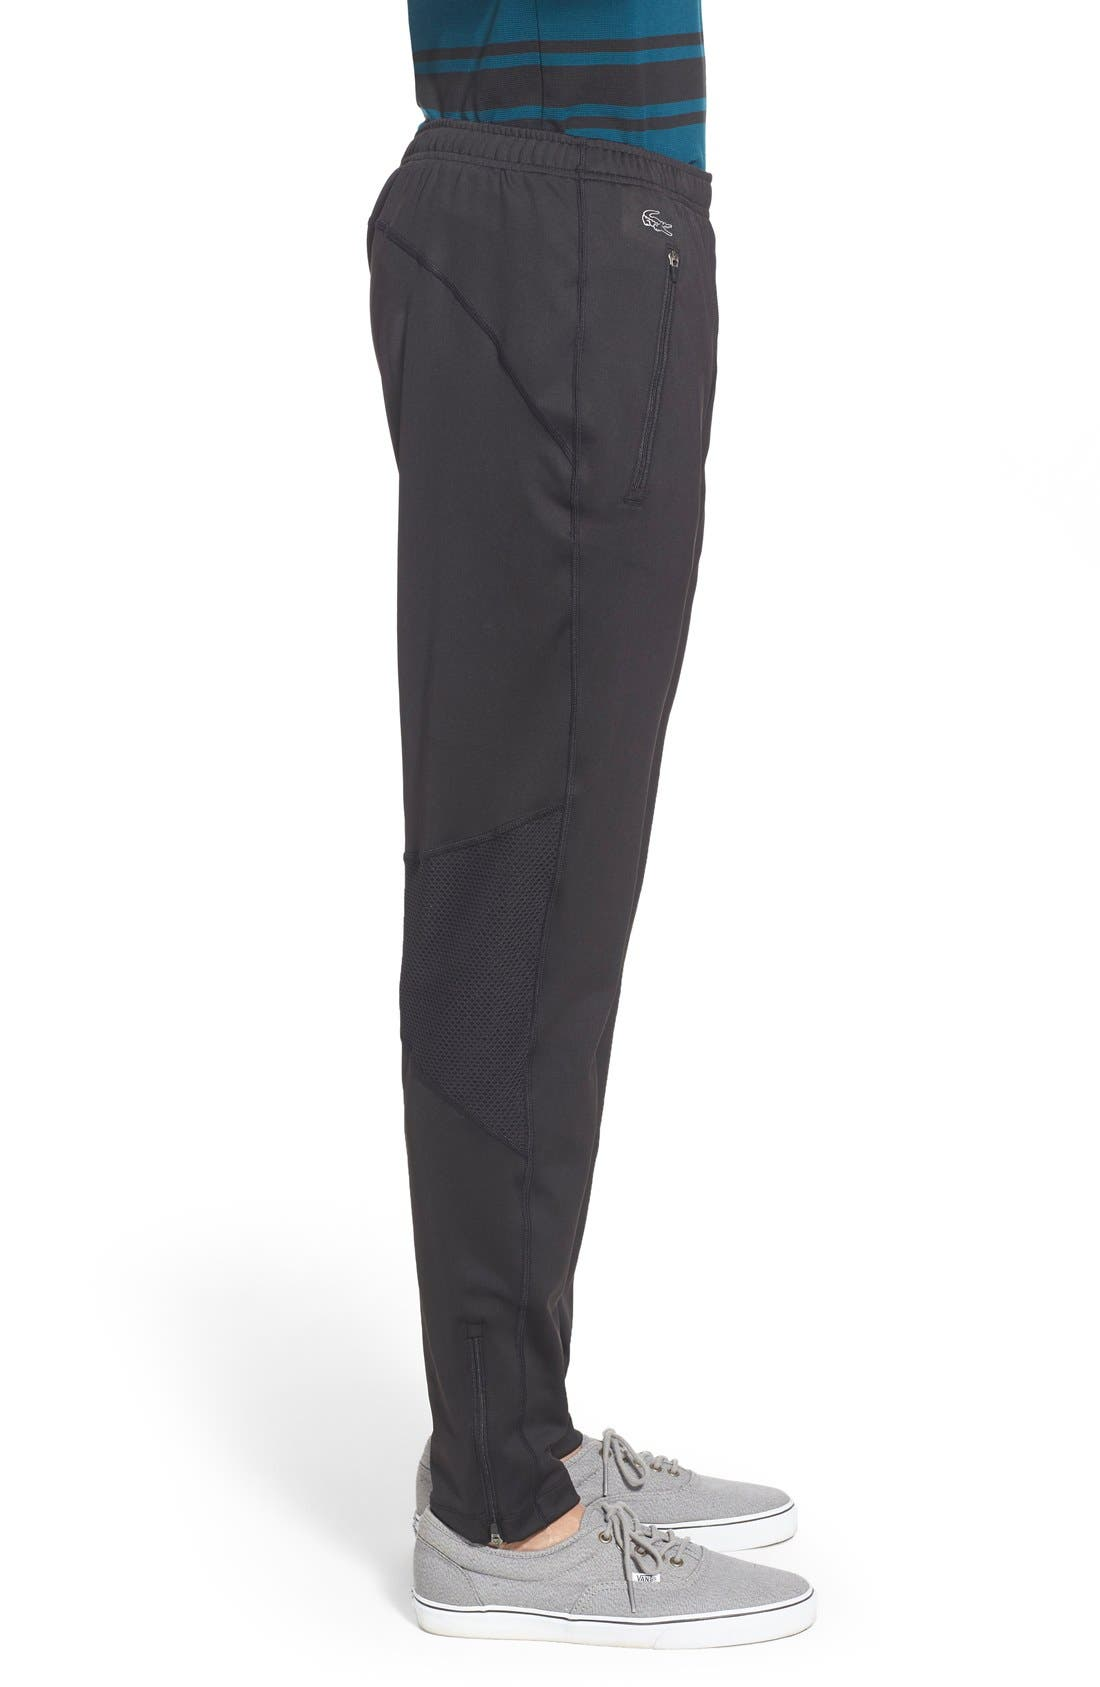 Alternate Image 3  - Lacoste'Sport' Ultra Dry Stretch Performance Track Pants